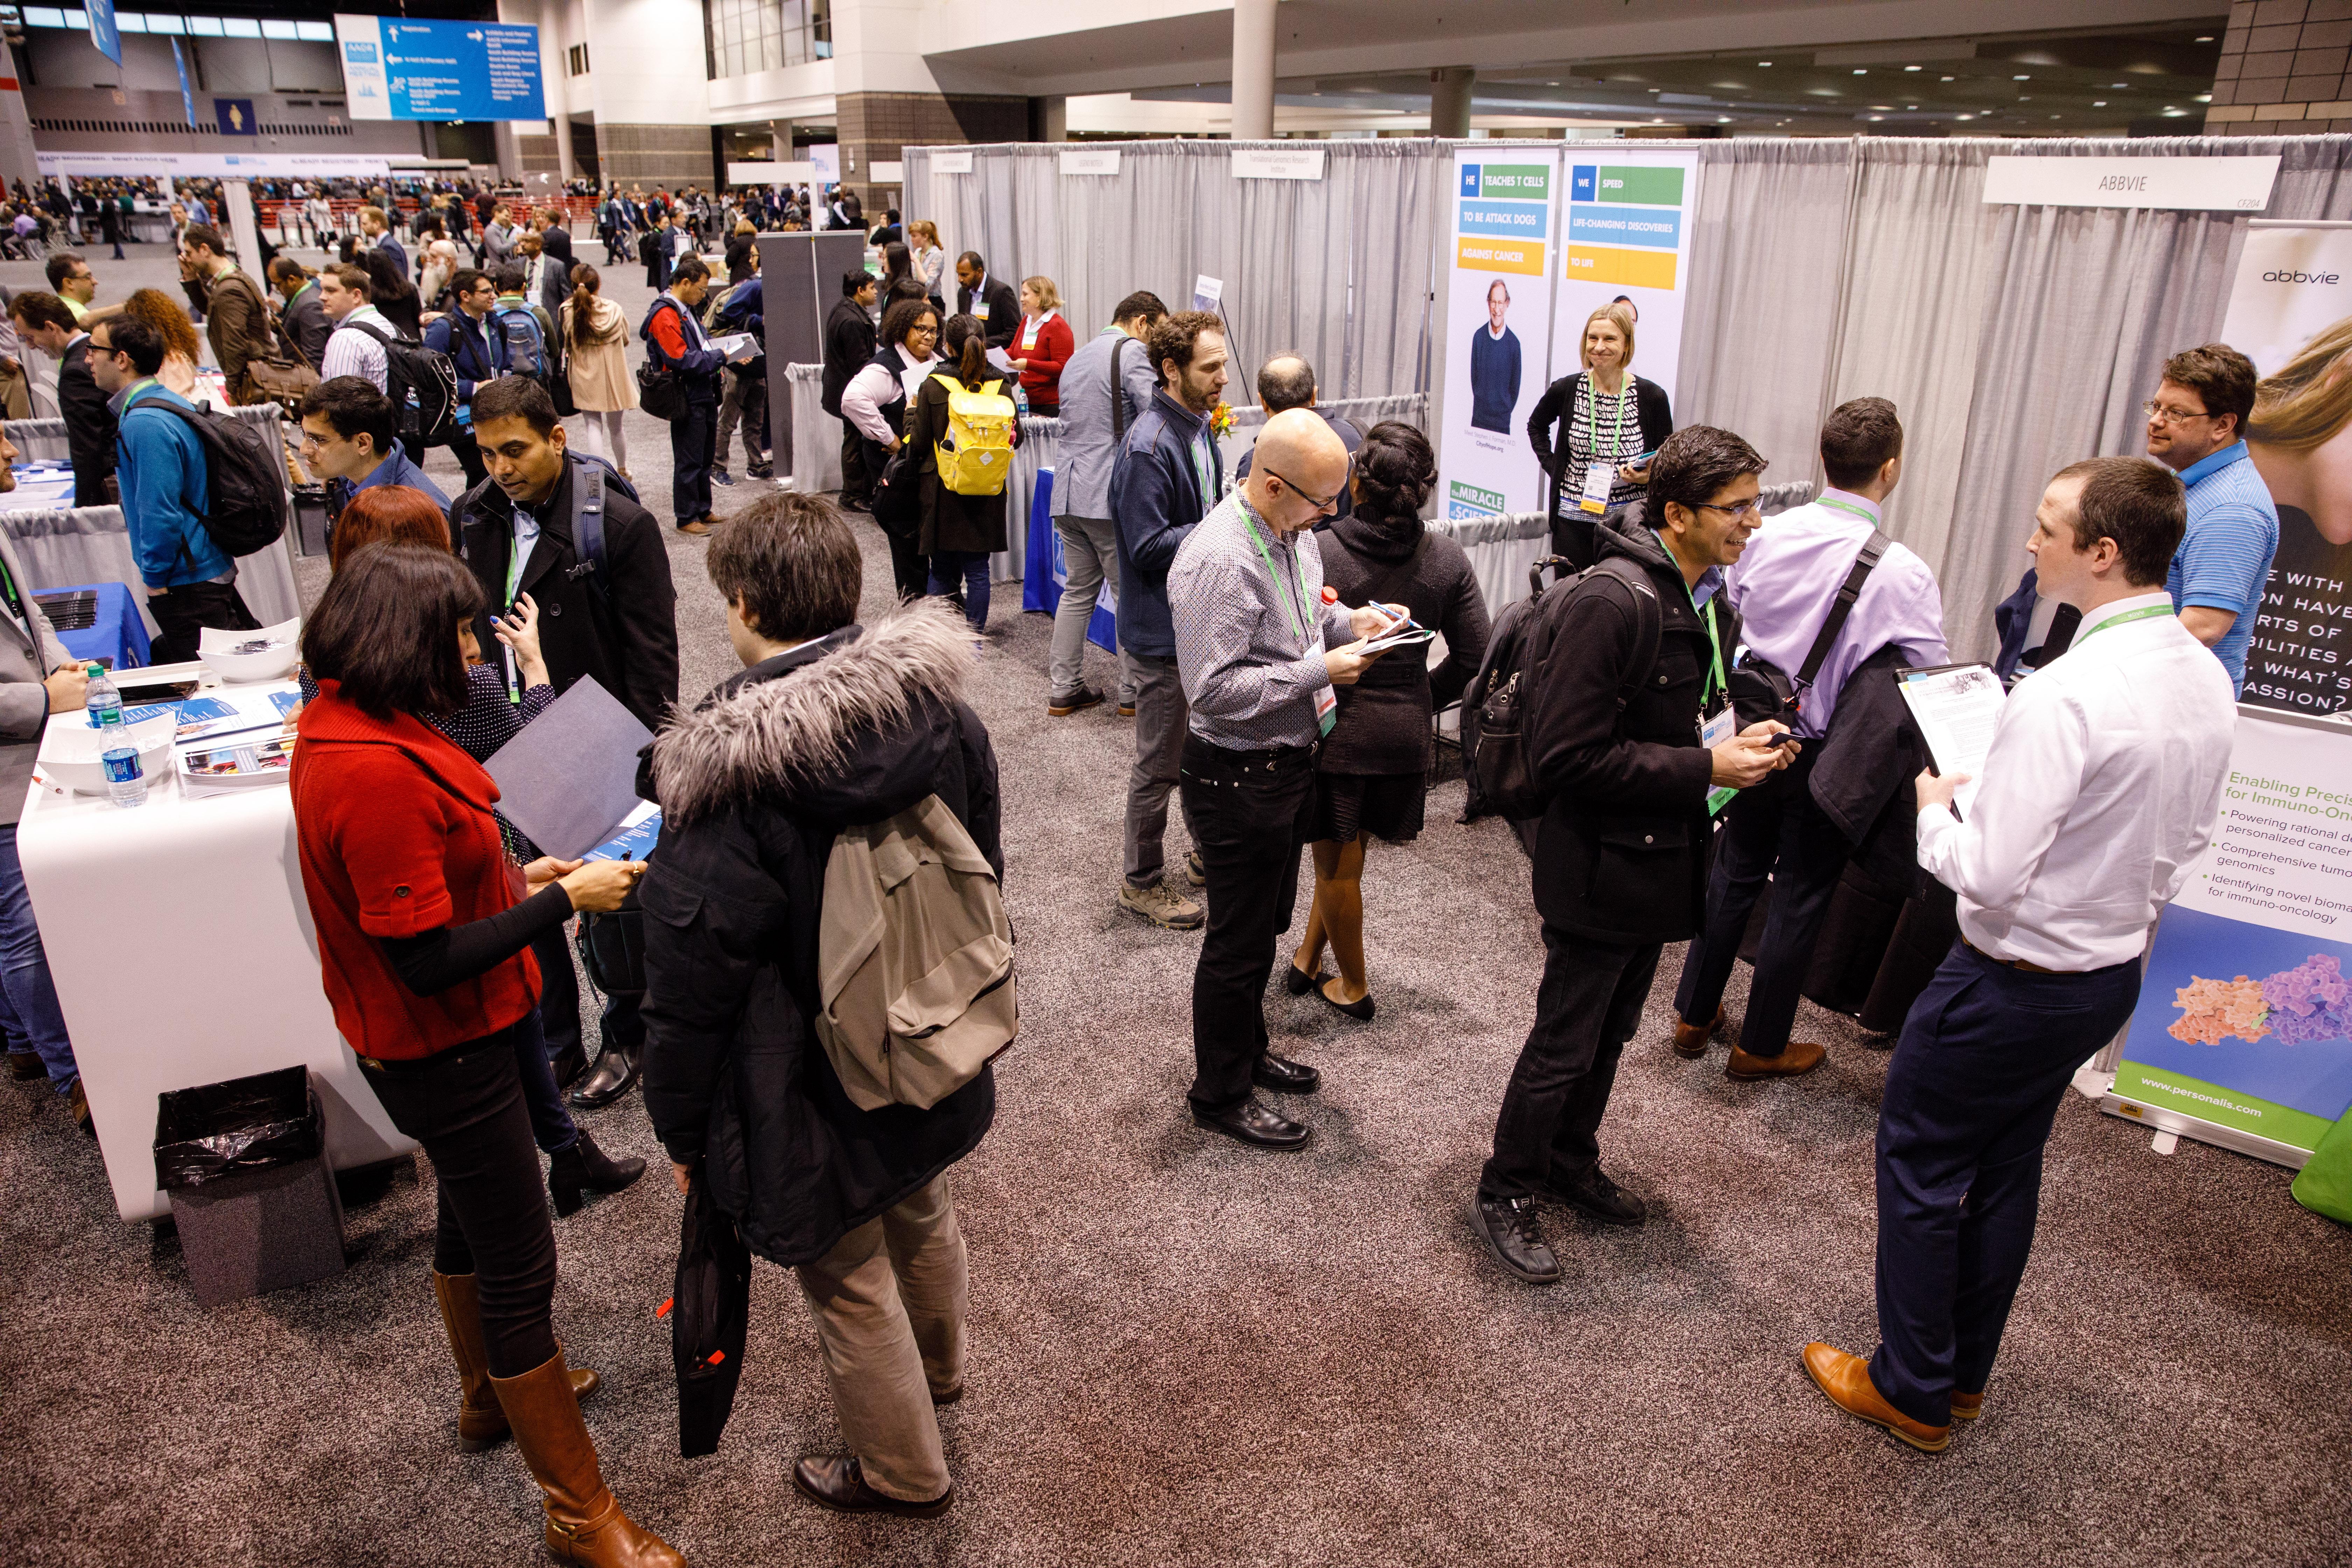 2019 Cancer & Biomedical Research Career Fair - STAT